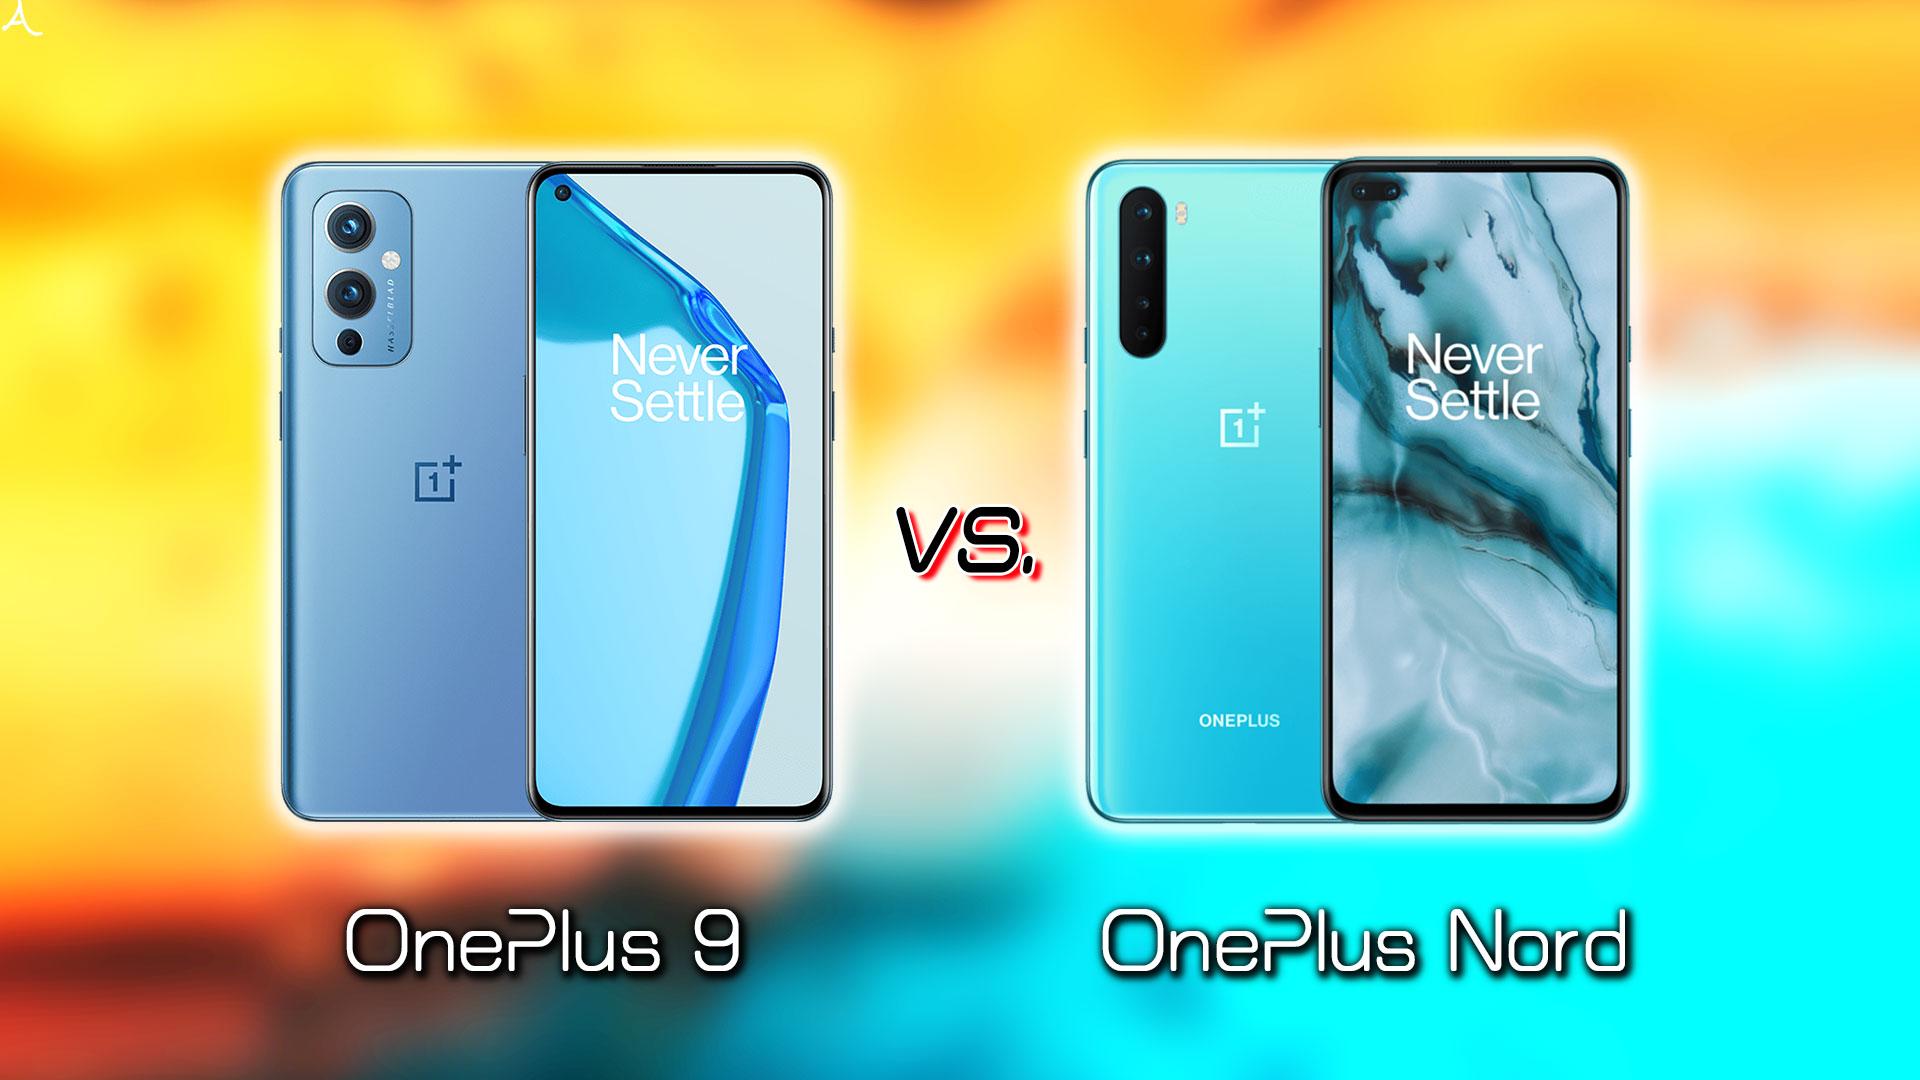 「OnePlus 9」と「OnePlus Nord」の違いを比較:どっちを買う?